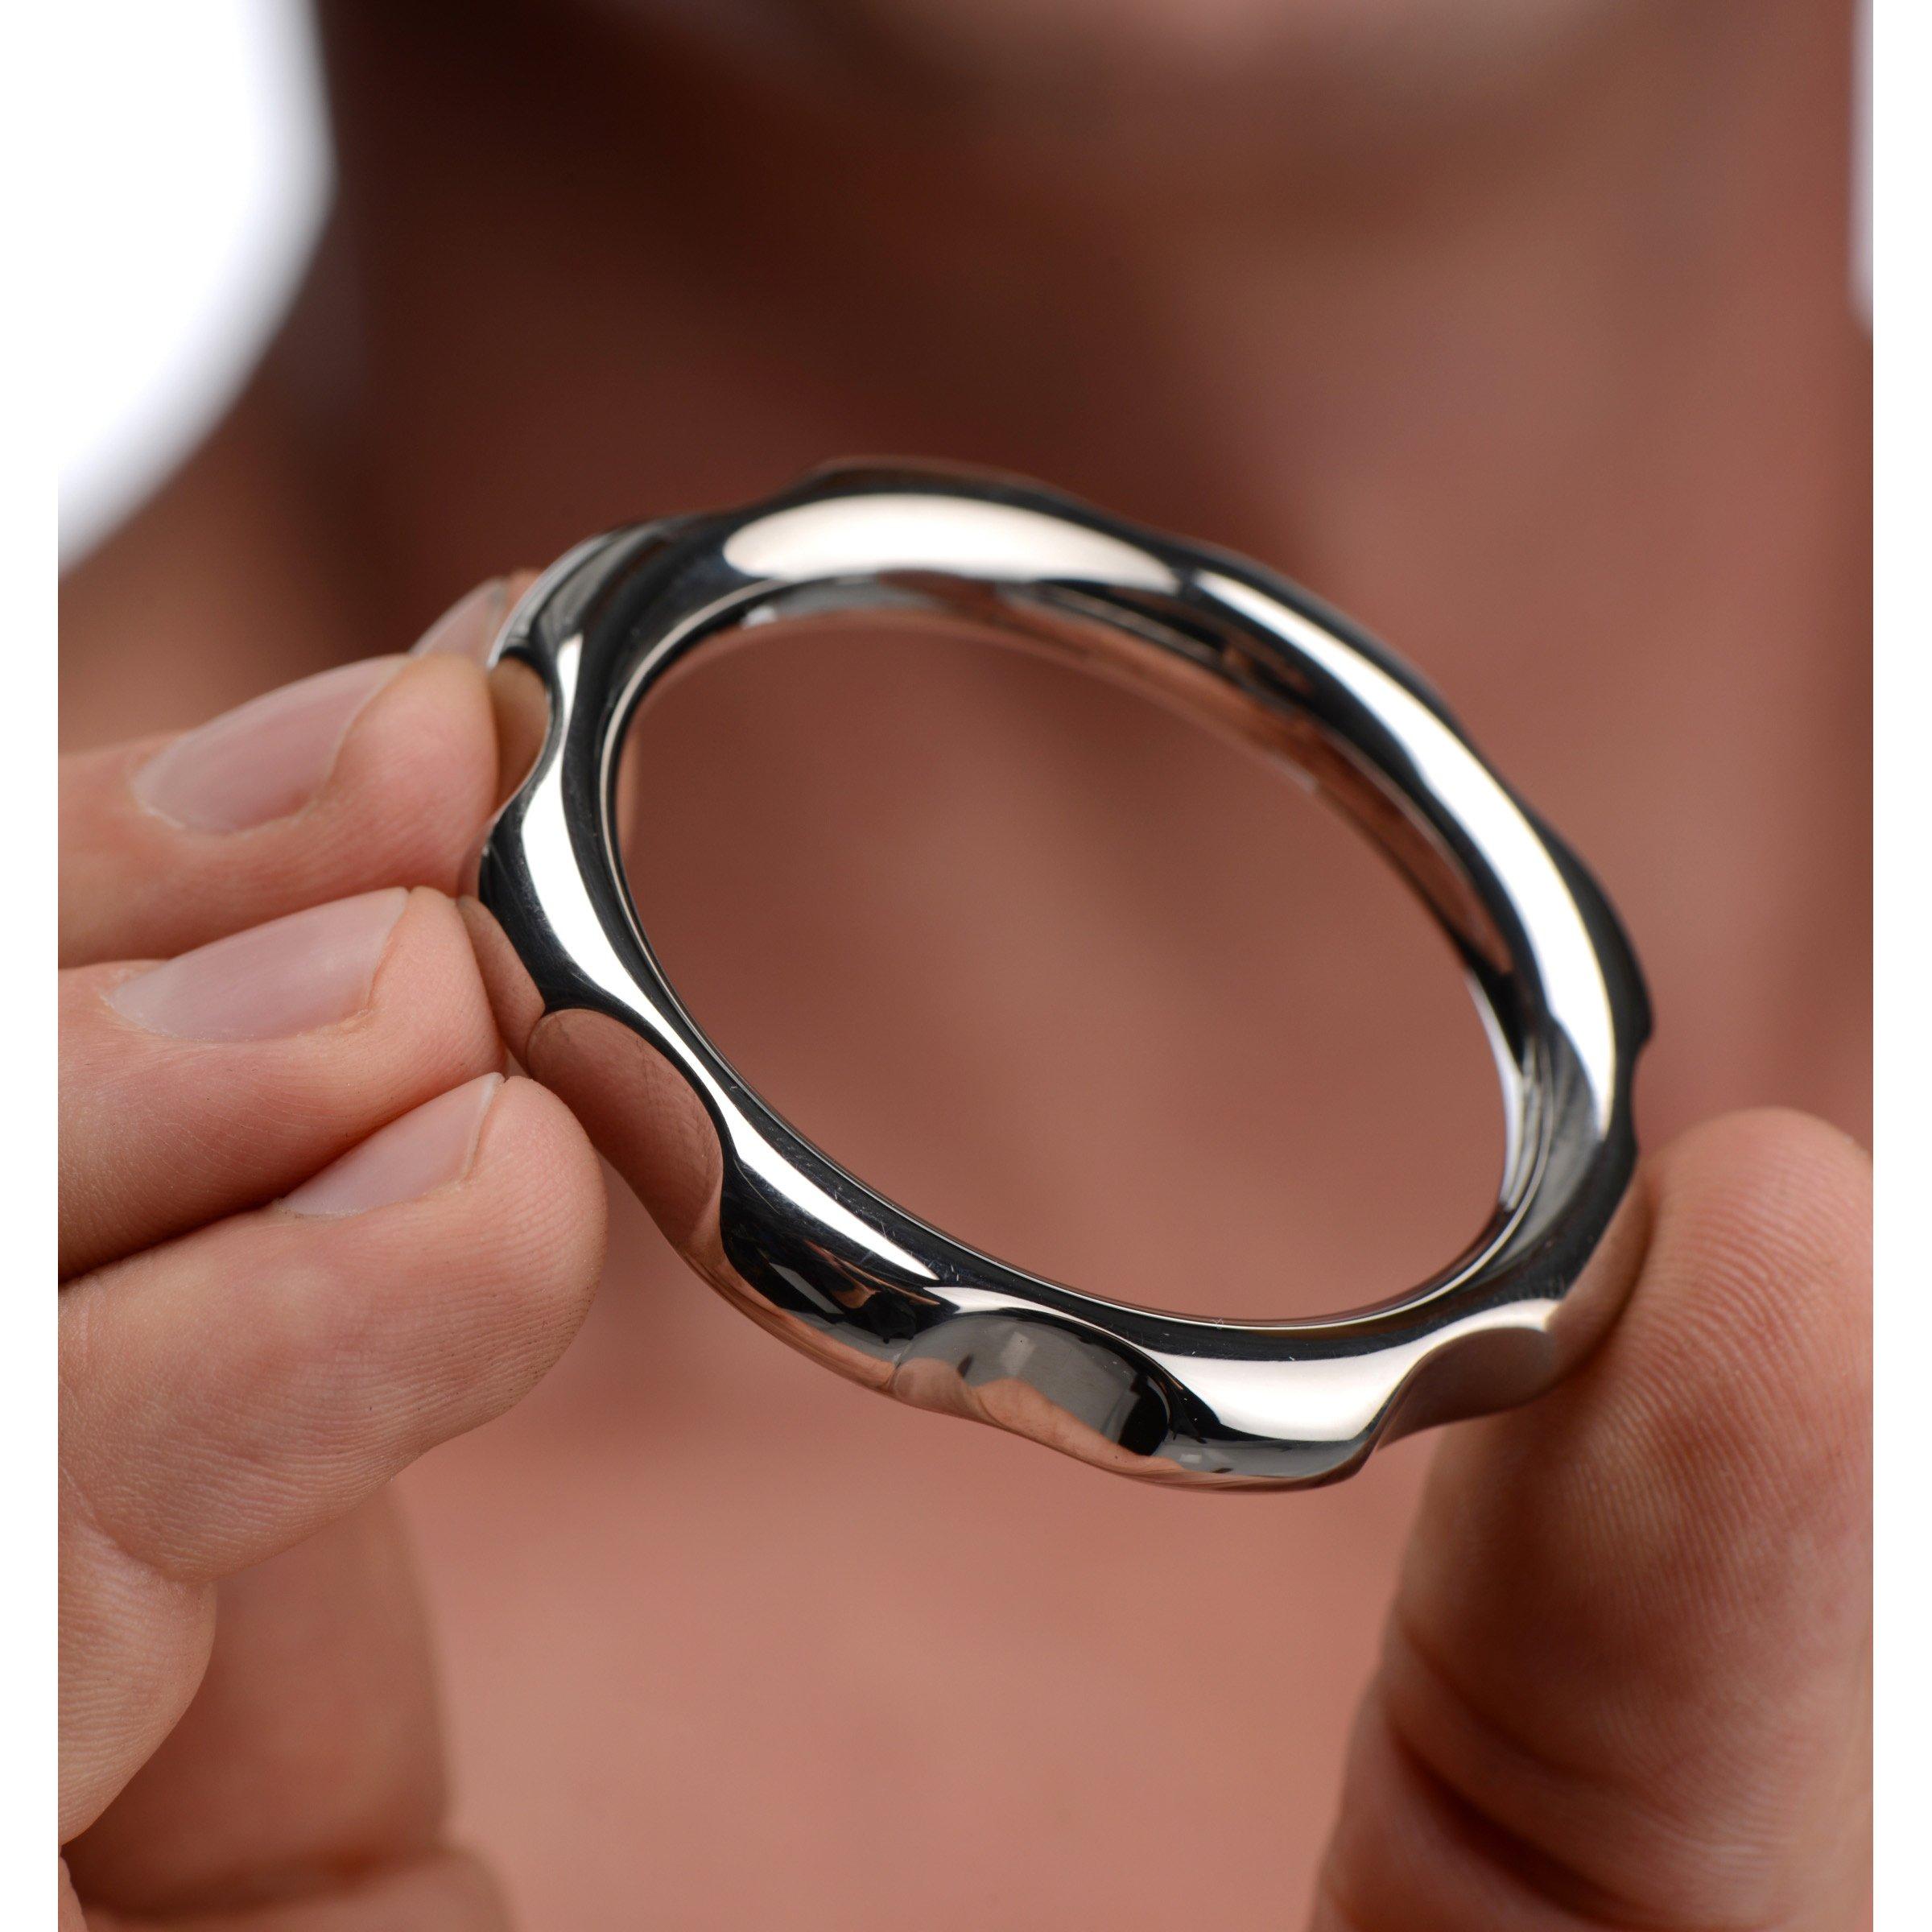 Gear Head Metal Cock Ring- 1.75 inch